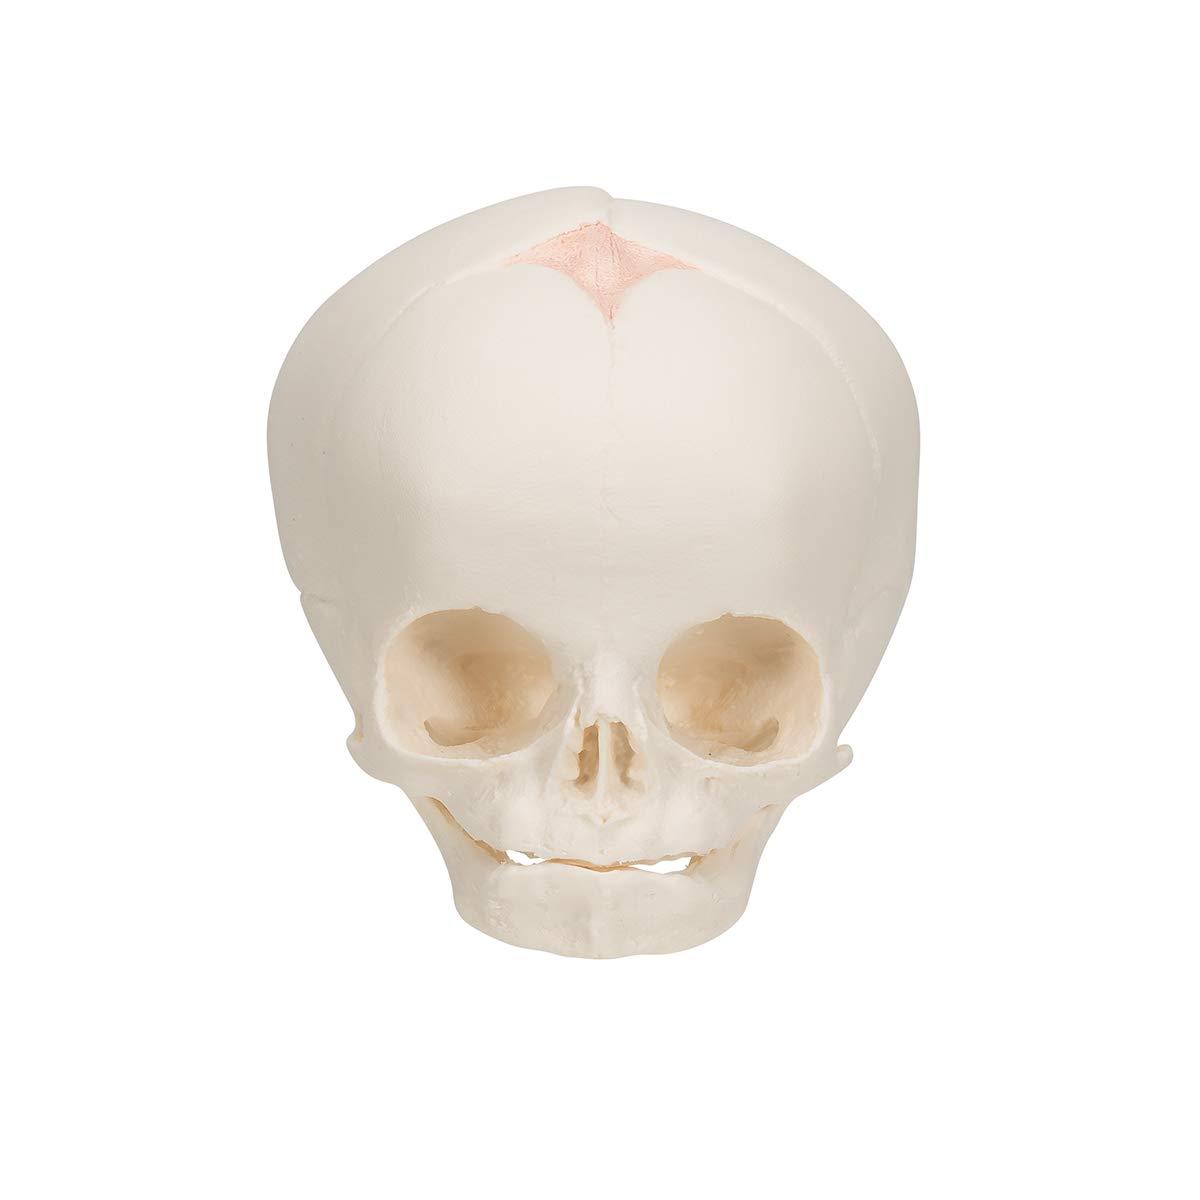 3B Scientific 30th Week of Pregnancy Natural Cast Fetal Skull Model on Stand